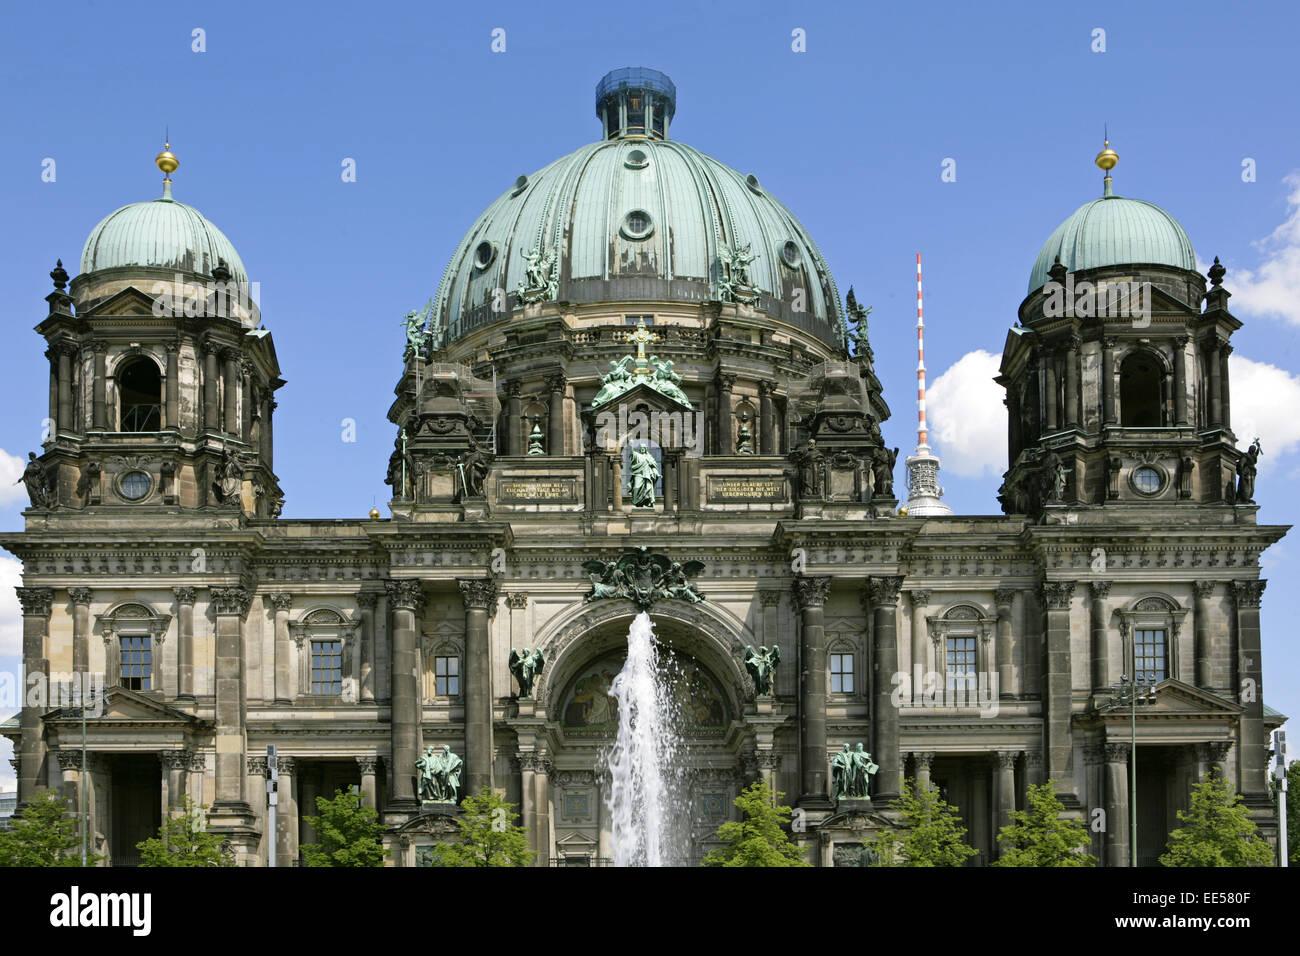 deutschland berlin europa hauptstadt stadt sehenswuerdigkeit stock photo royalty free. Black Bedroom Furniture Sets. Home Design Ideas